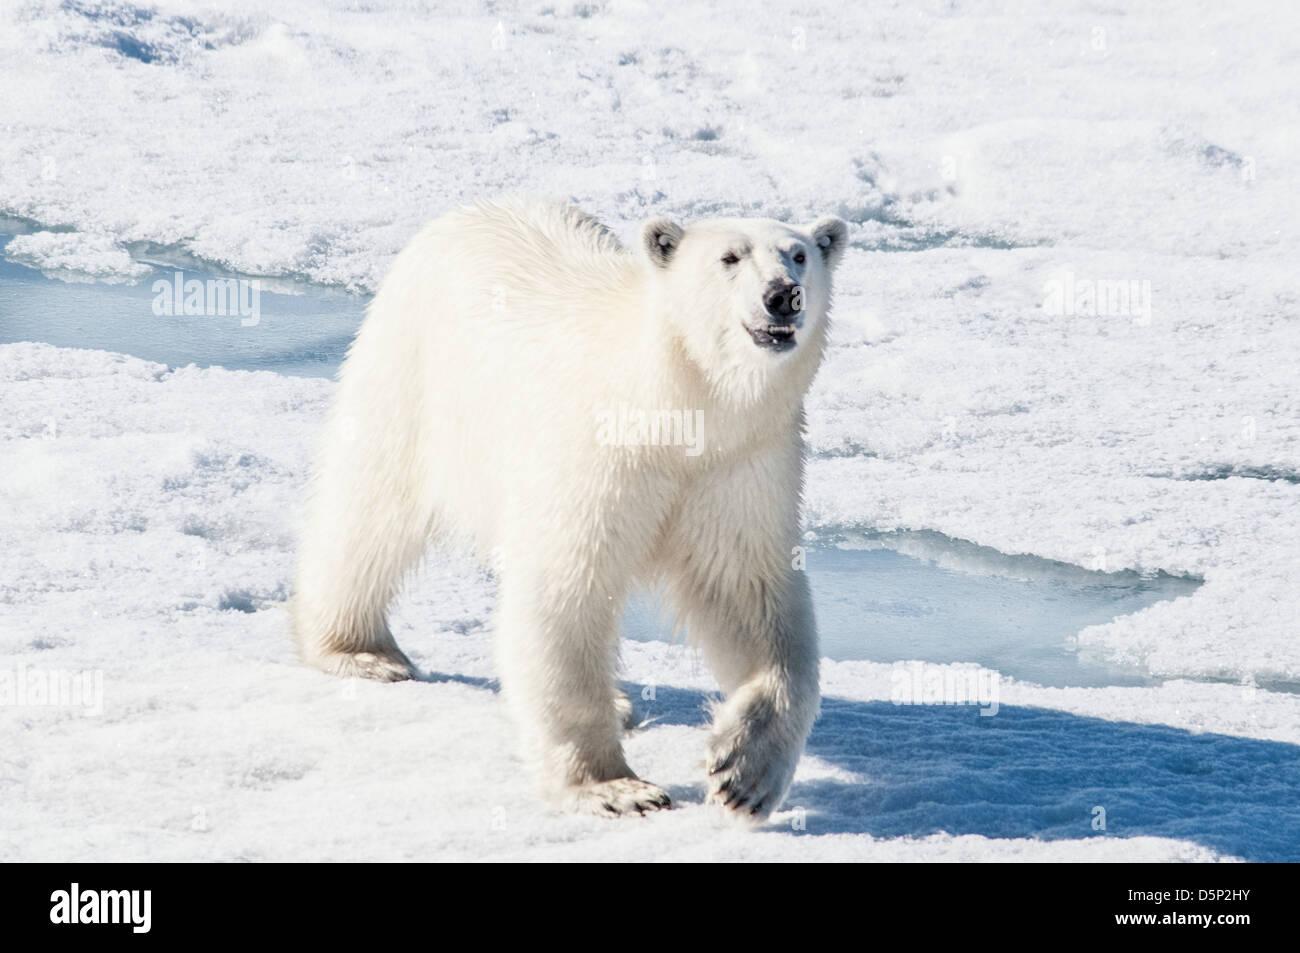 Young adult tagged Polar Bear, Ursus maritimus, walking on pack ice, Bjornsundet, Svalbard Archipelago, Norway Stock Photo